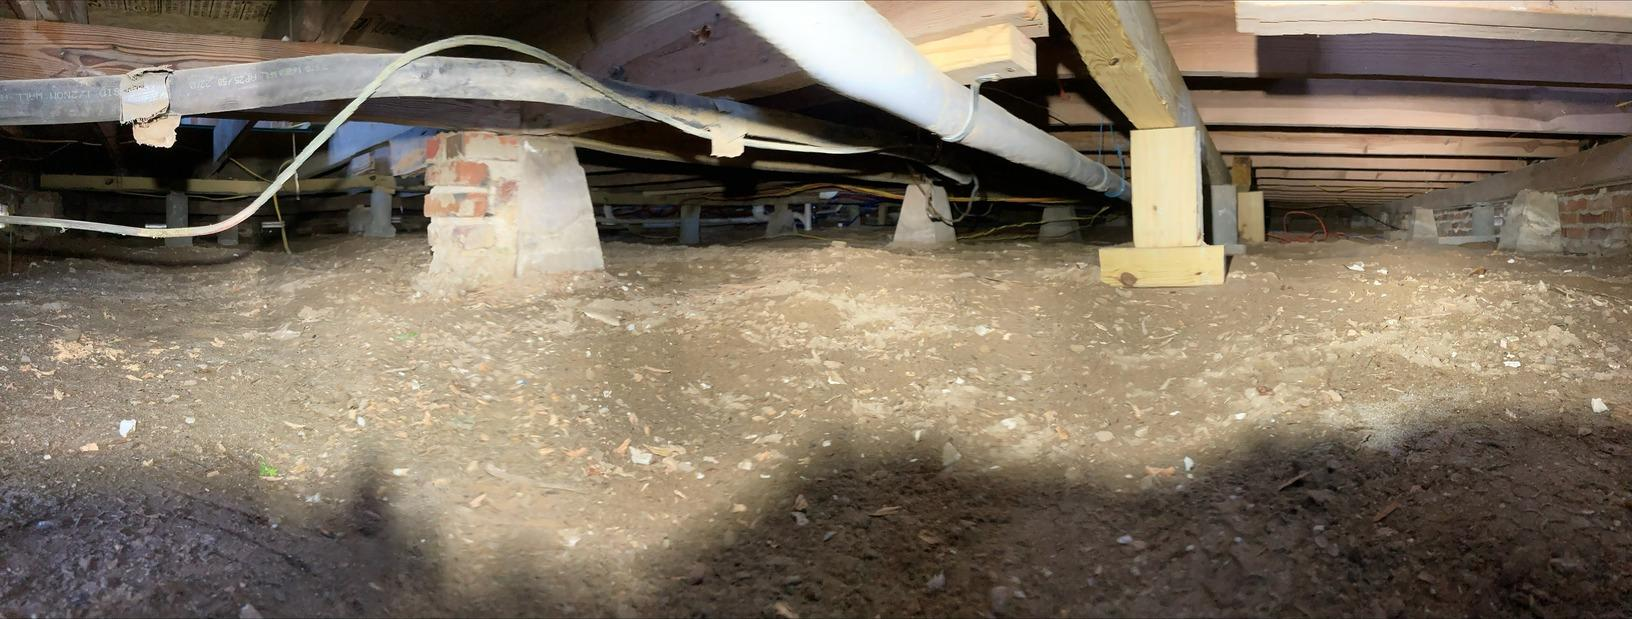 Crawl Space Waterproofing in Ruston, LA - Before Photo